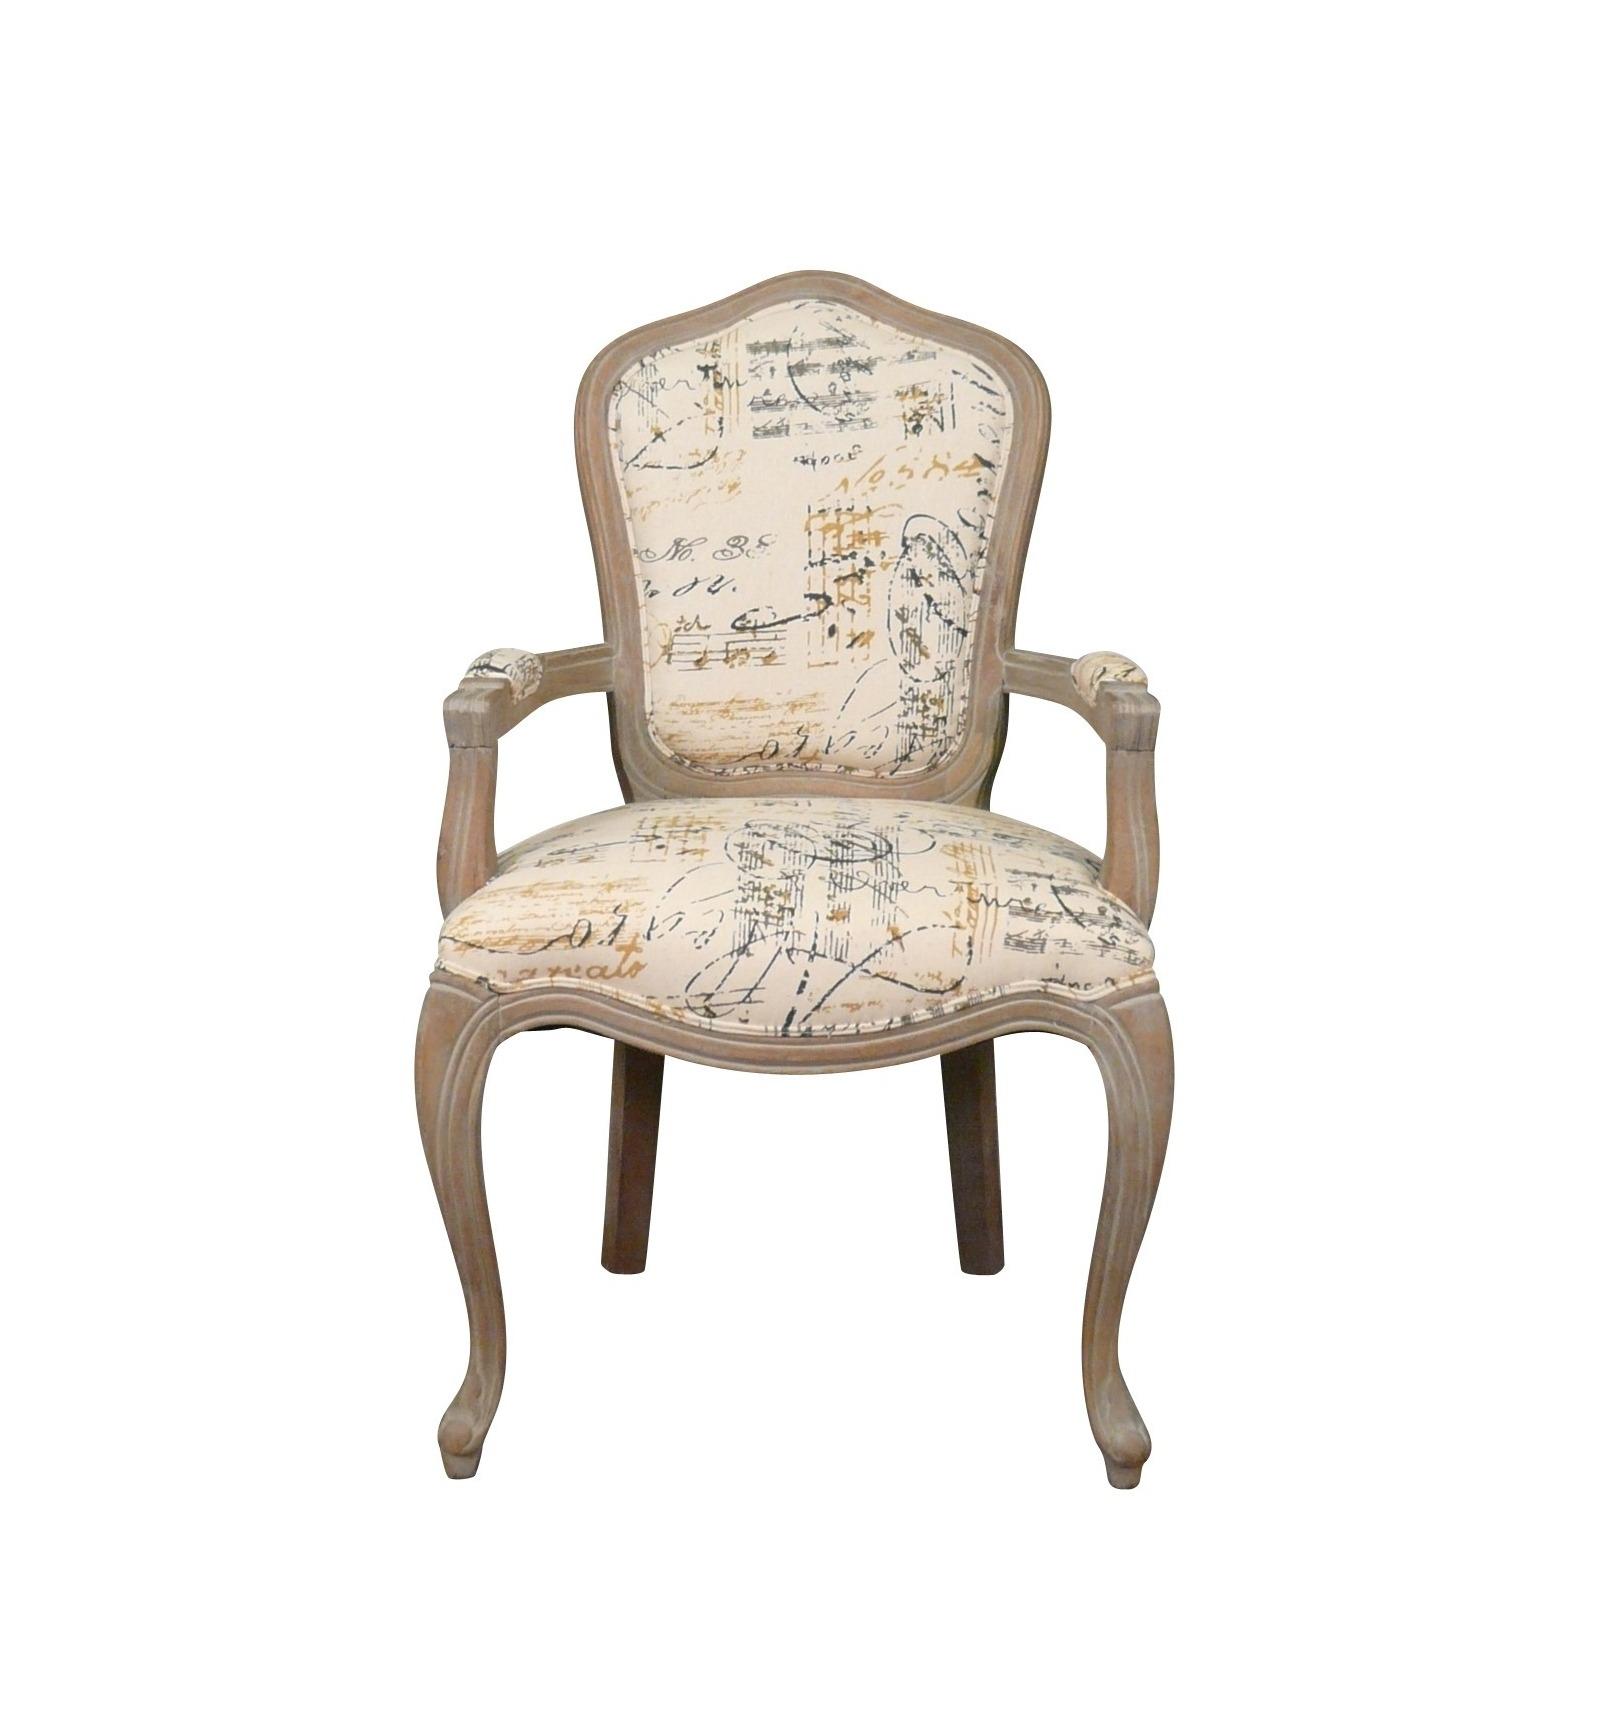 Chaise Salle A Manger Louis Xv fauteuil louis xv amadeus